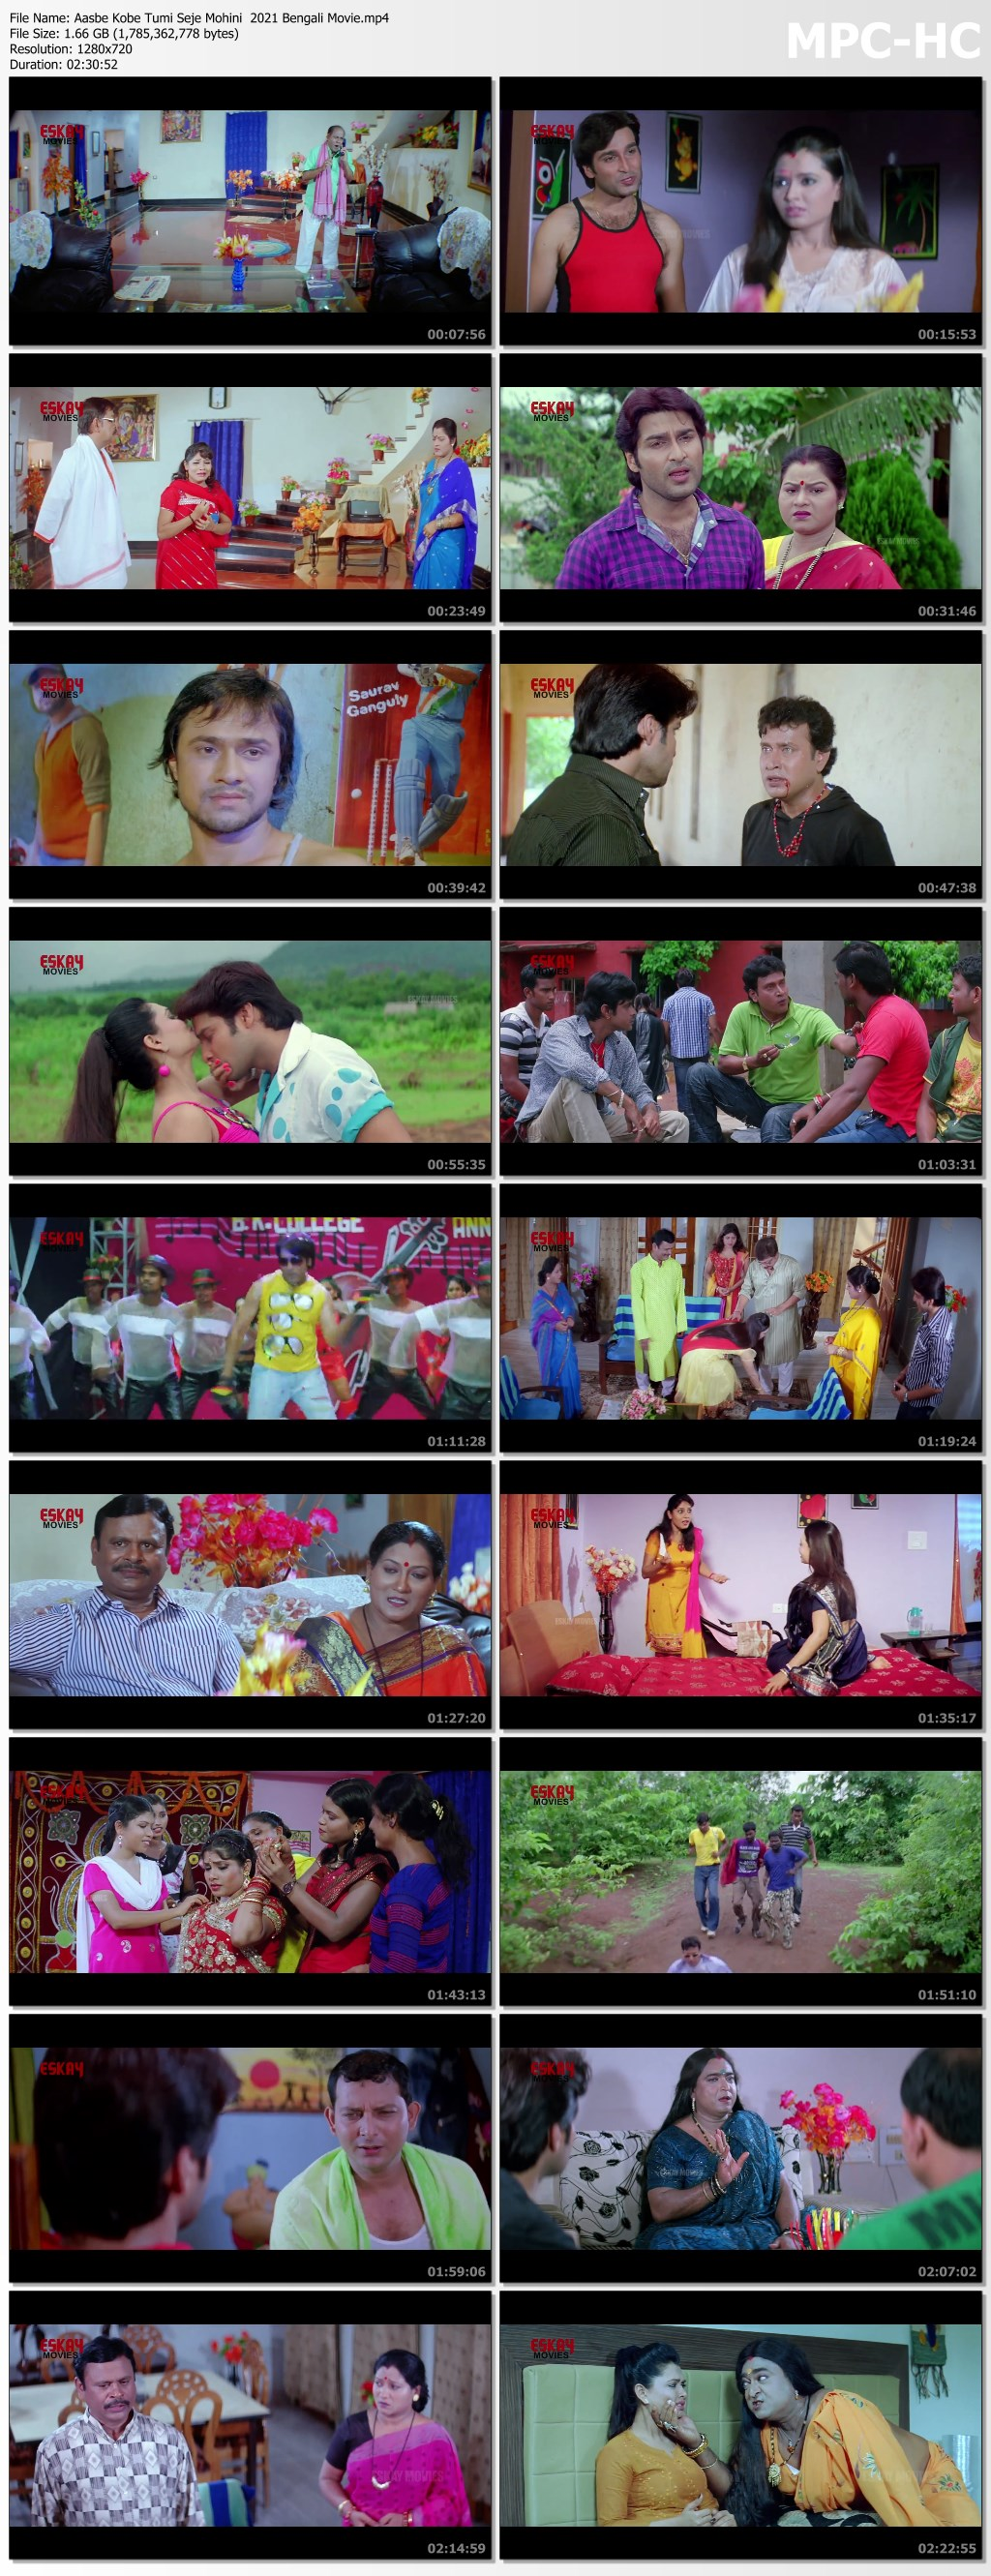 Aasbe Kobe Tumi Seje Mohini 2021 Bengali Movie.mp4 thumbs